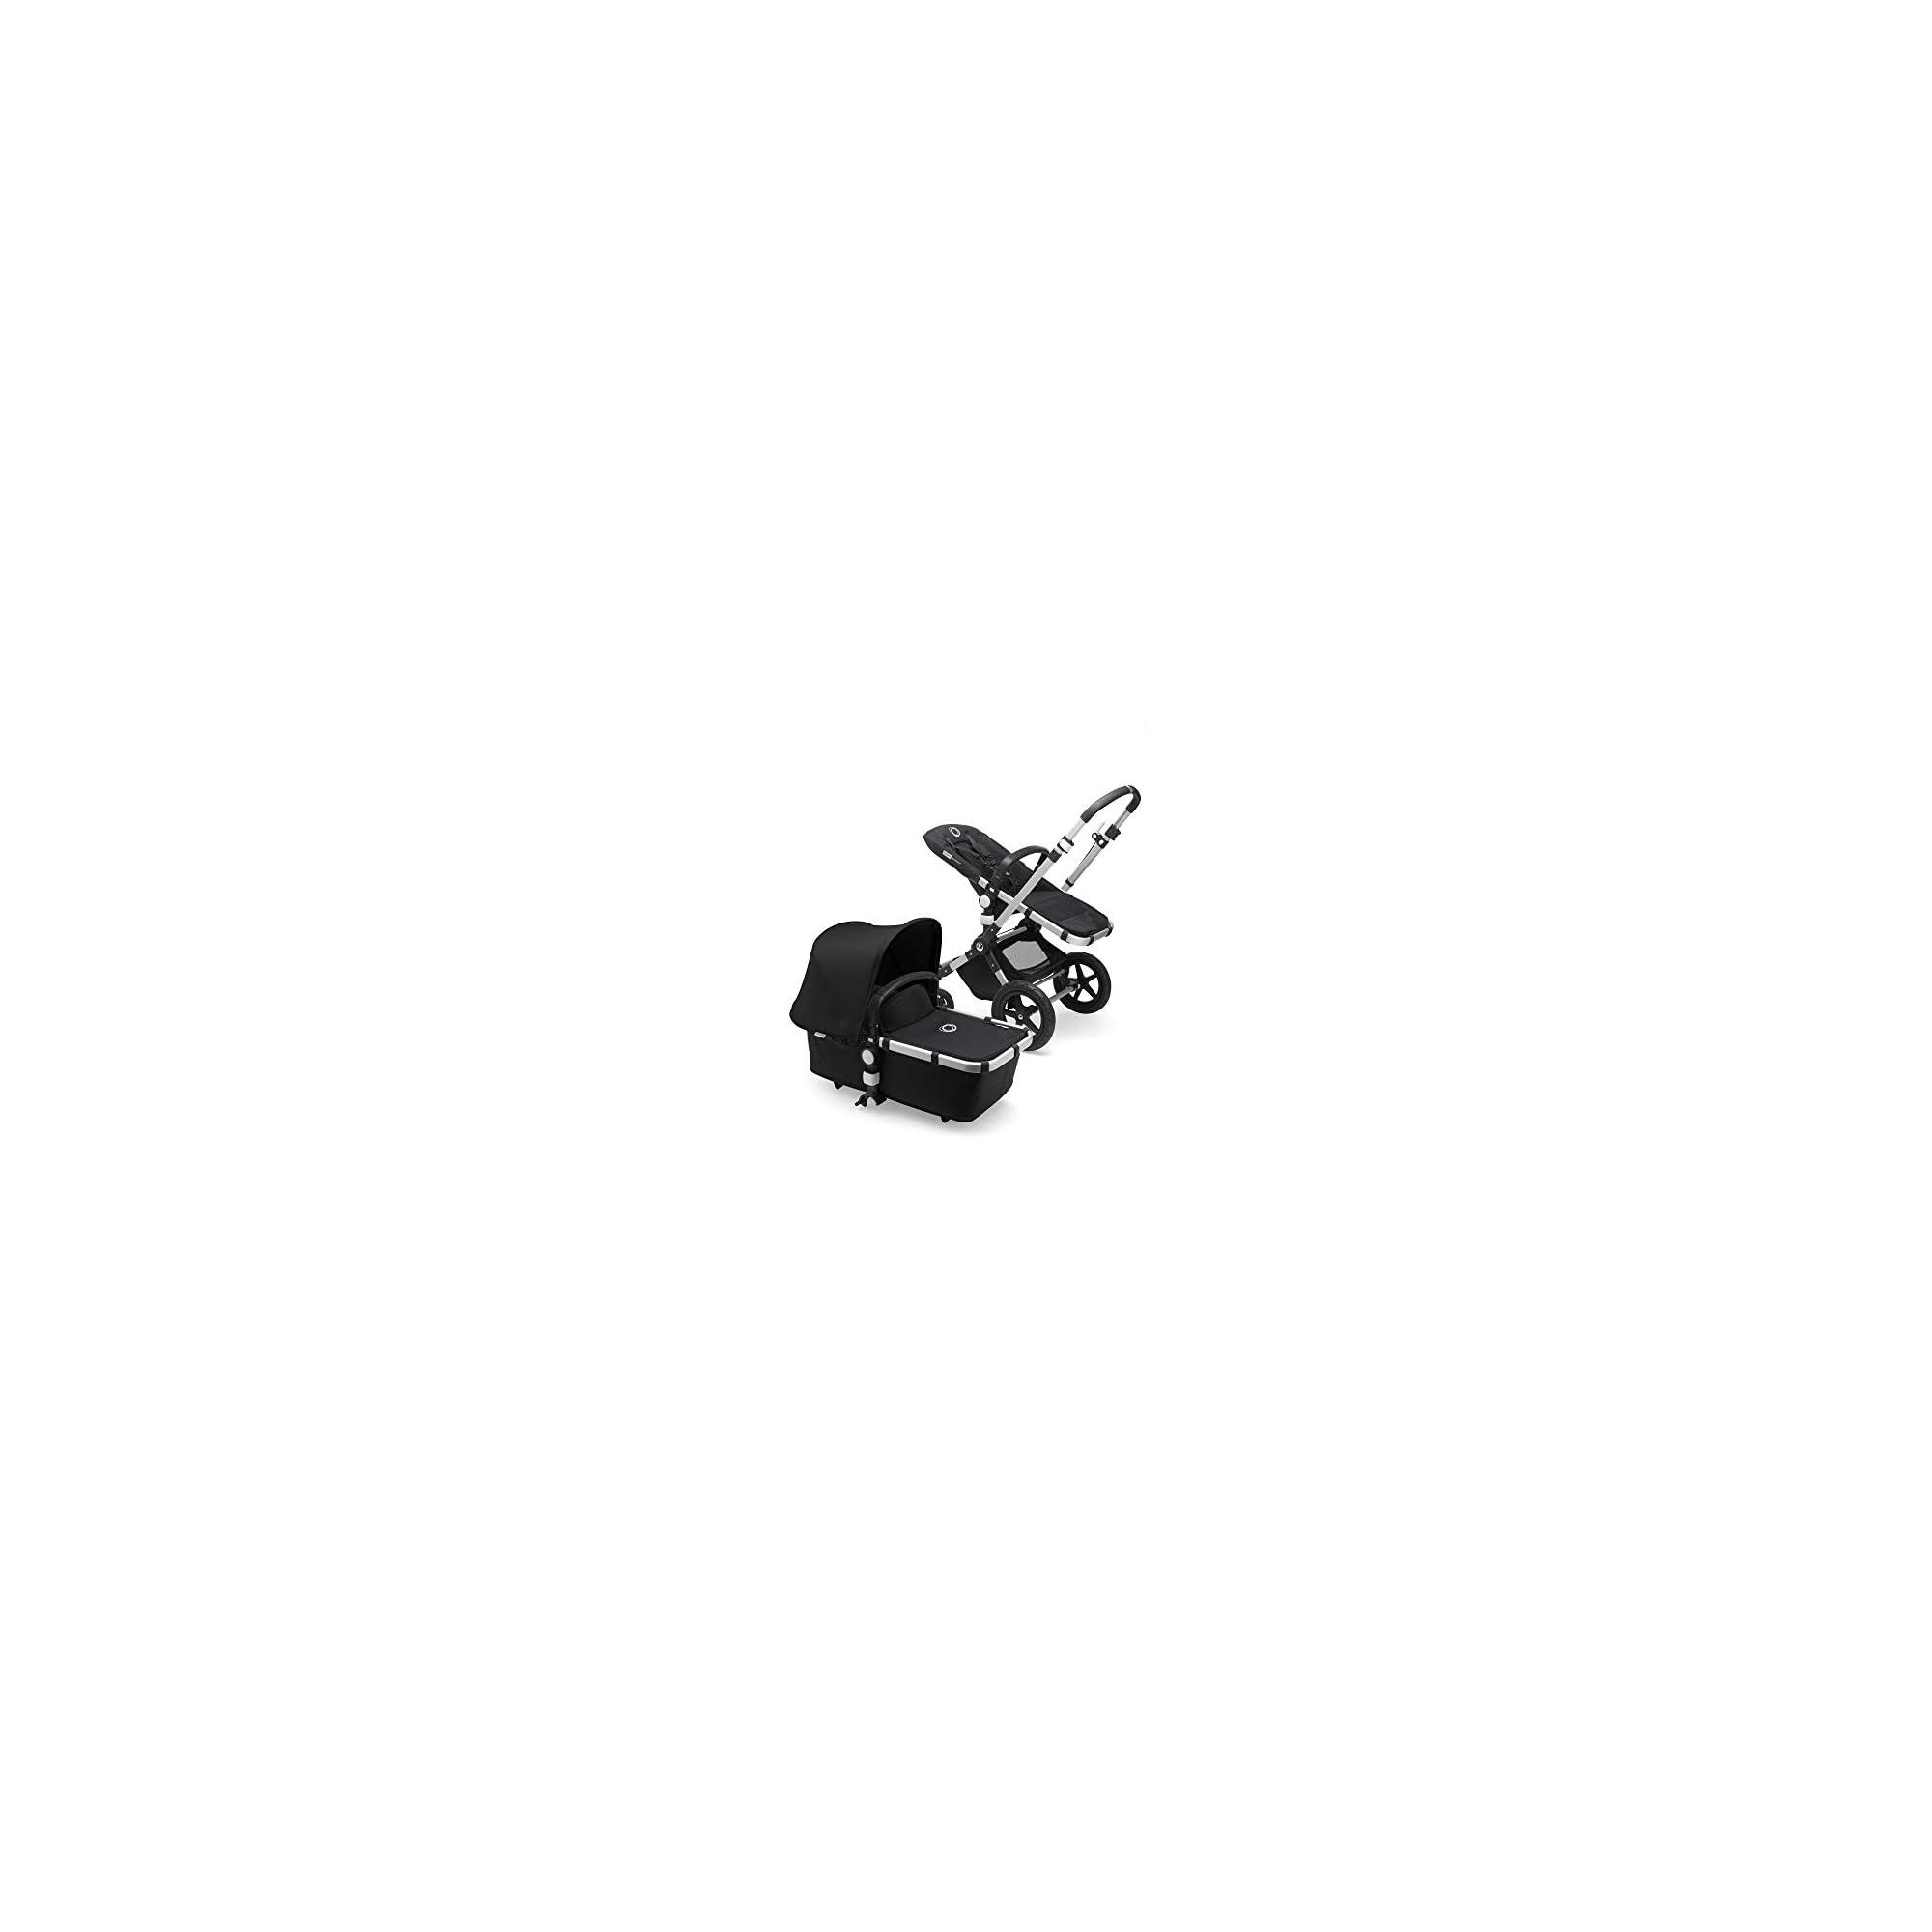 Bugaboo Cameleon3 Plus Complete Stroller, Alu/Black/Black – Versatile, Foldable Mid-Size Stroller with Adjustable Handlebar, Reversible Seat and Car Seat Compatibility